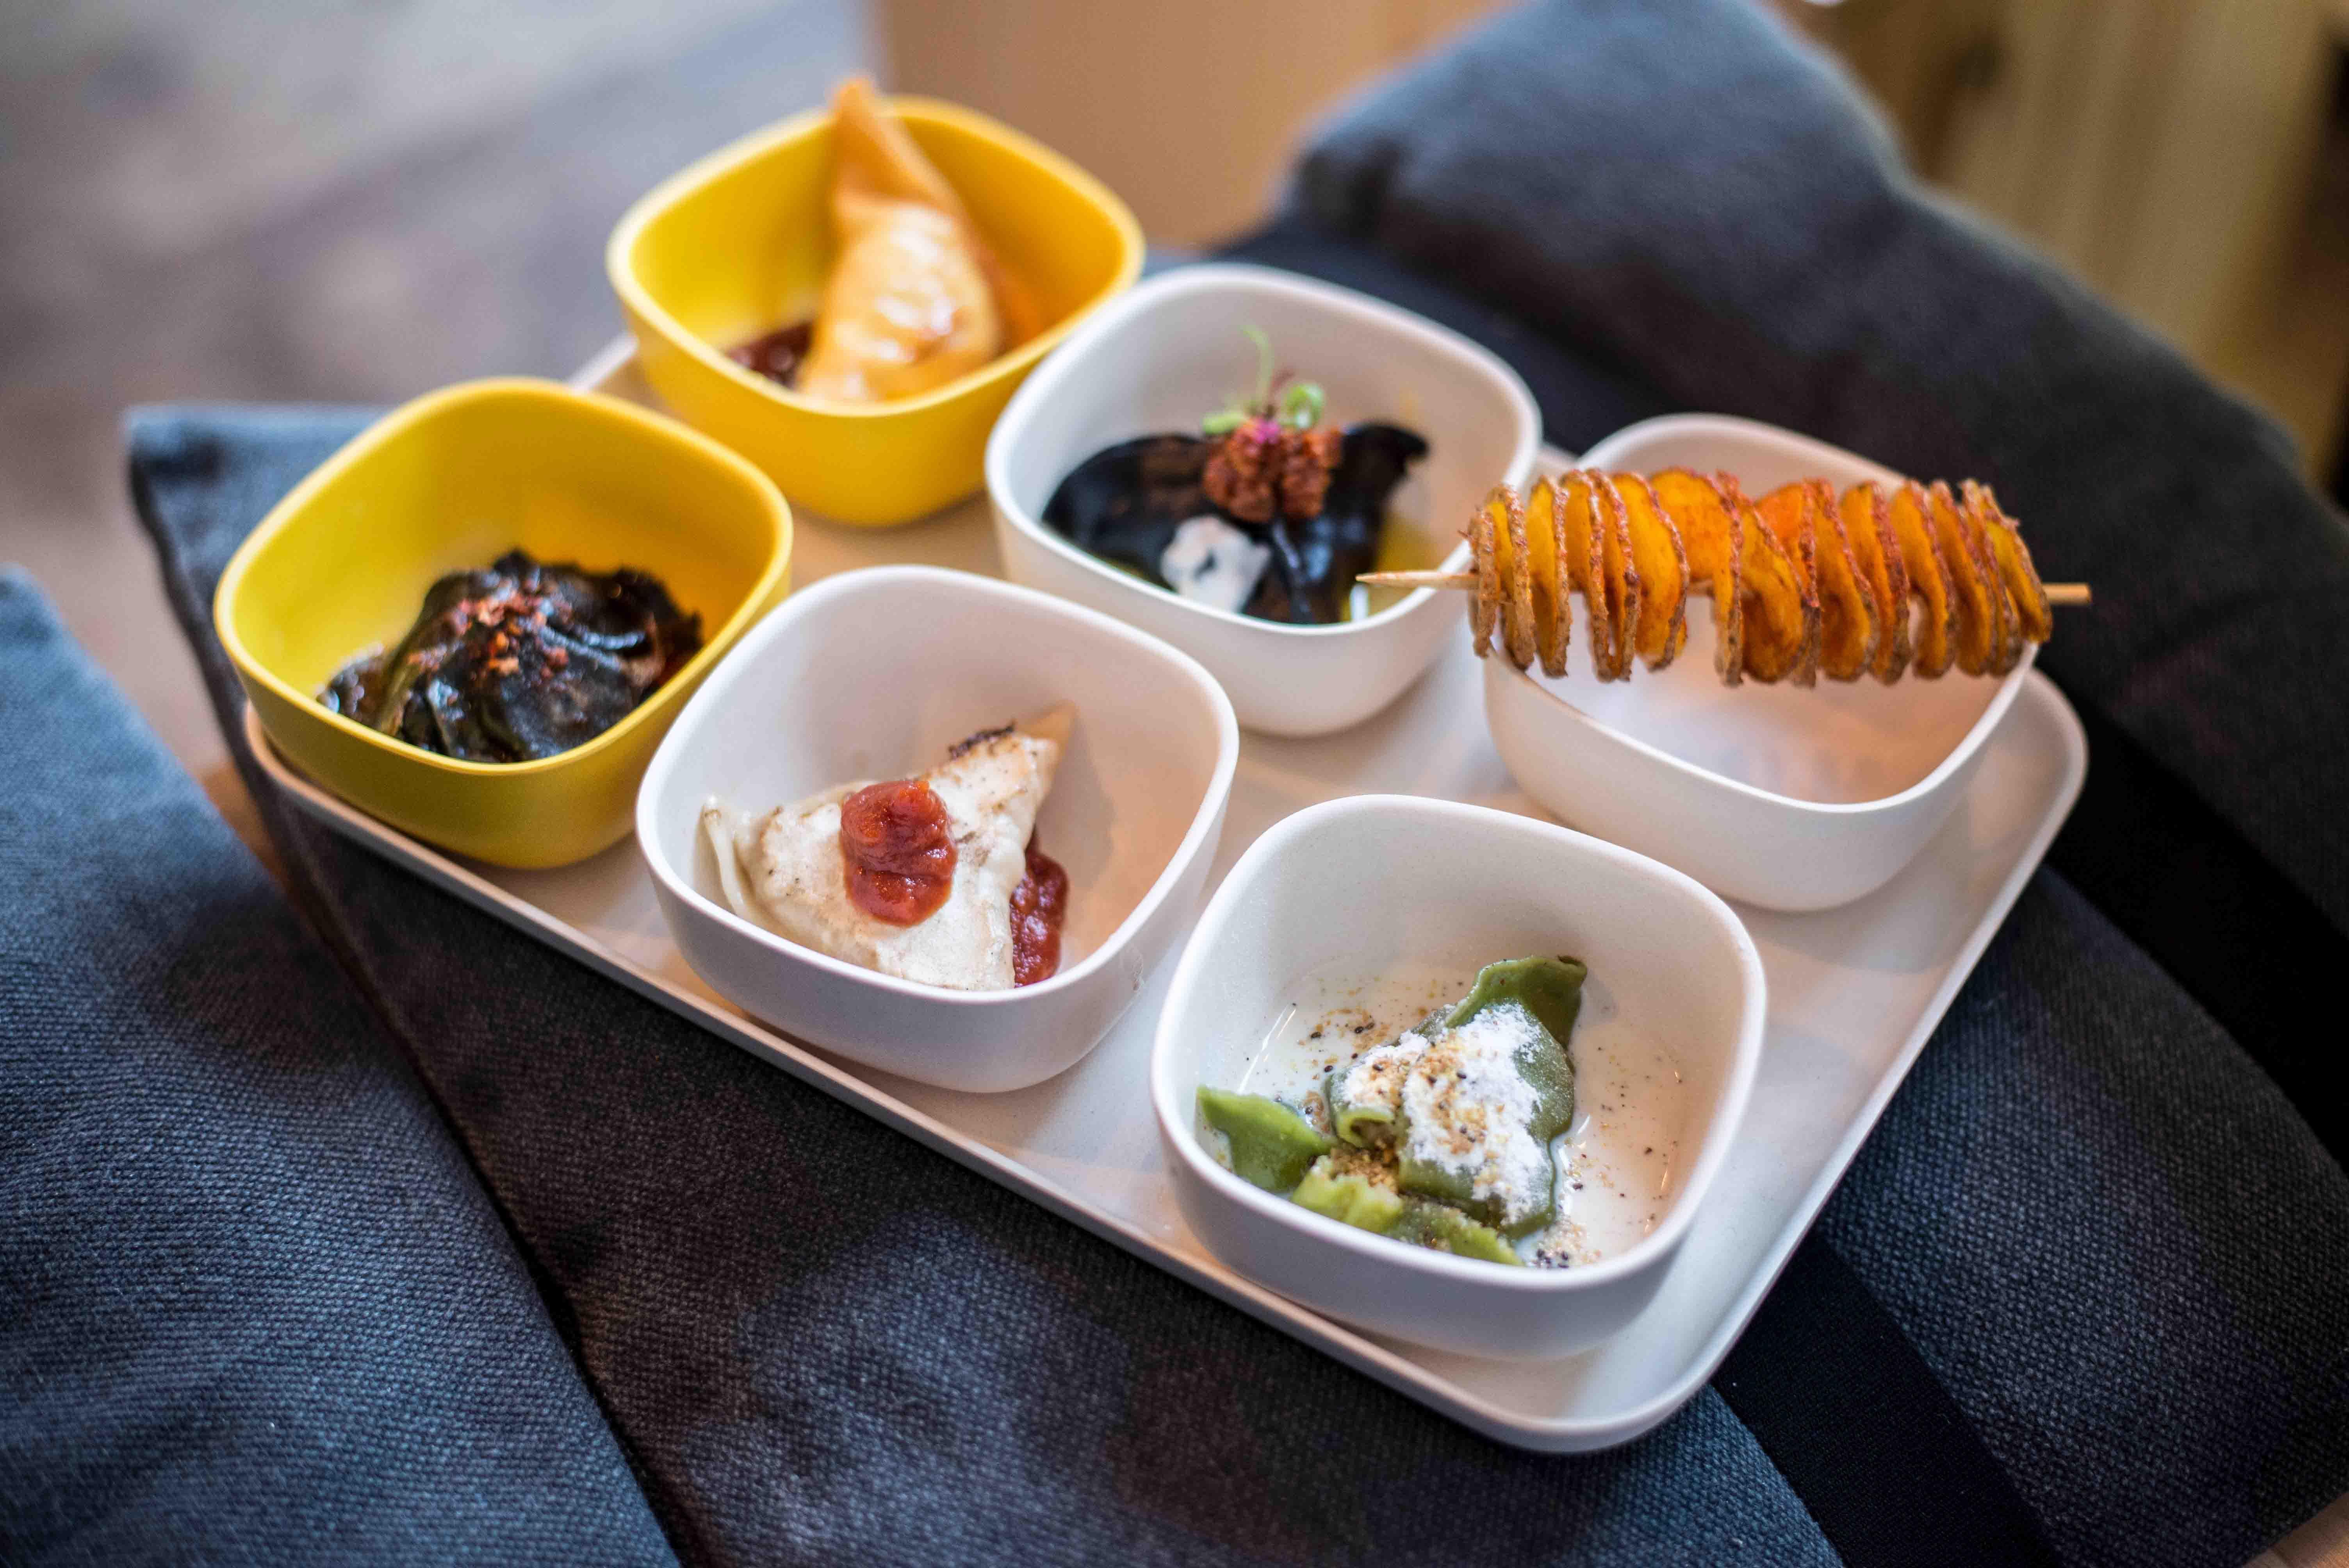 Nachhaltige Restaurants in Berlin – DingsDums Dumplings